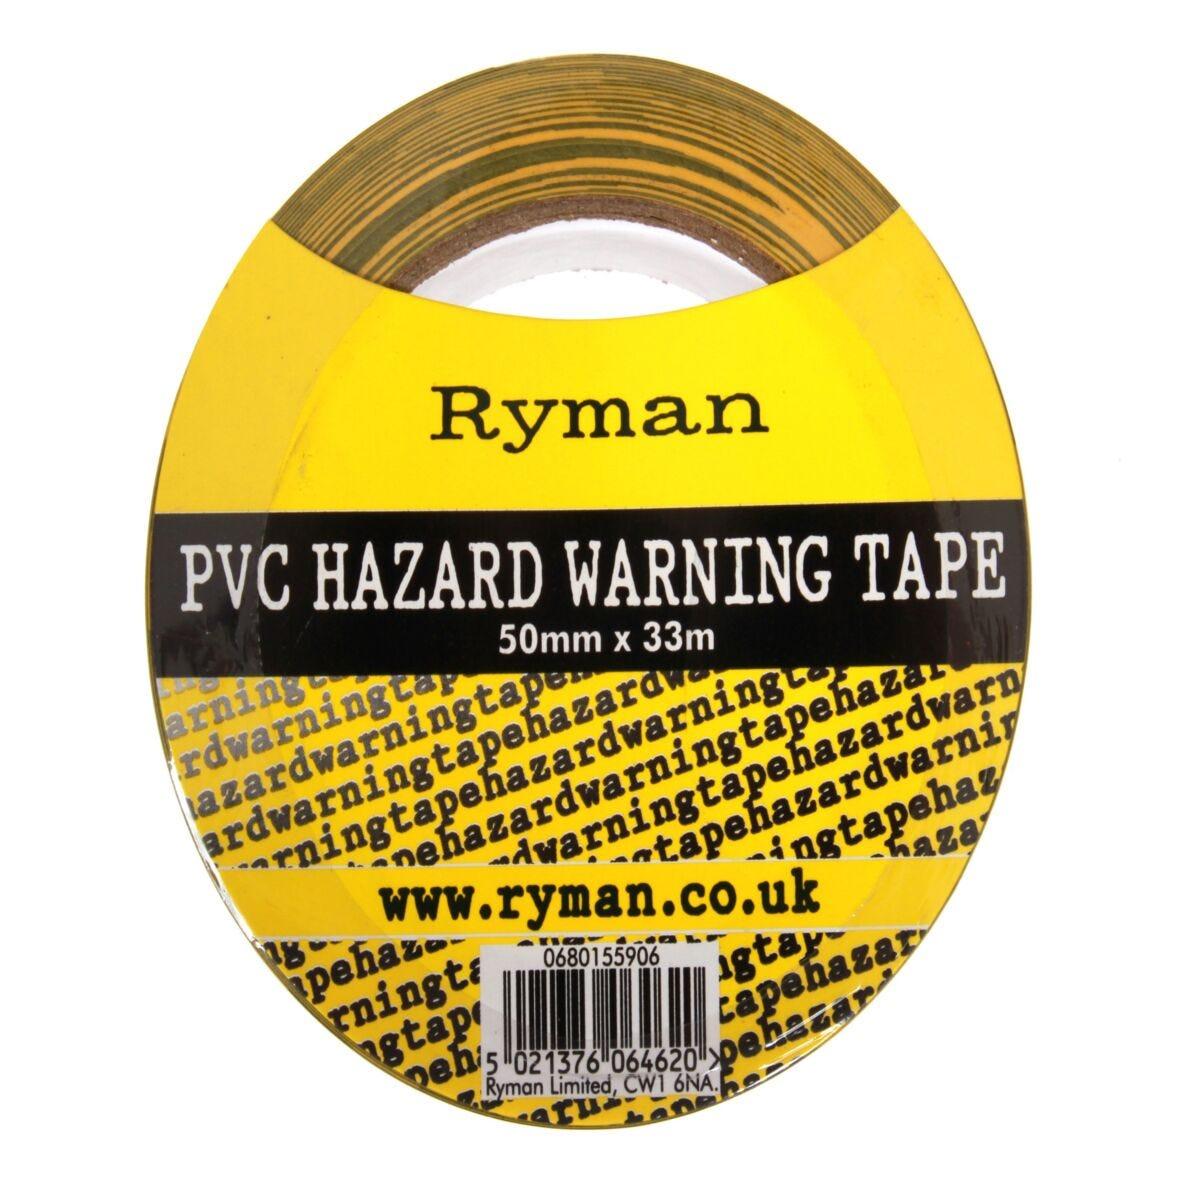 Ryman Hazard Warning Tape 50mmx33m